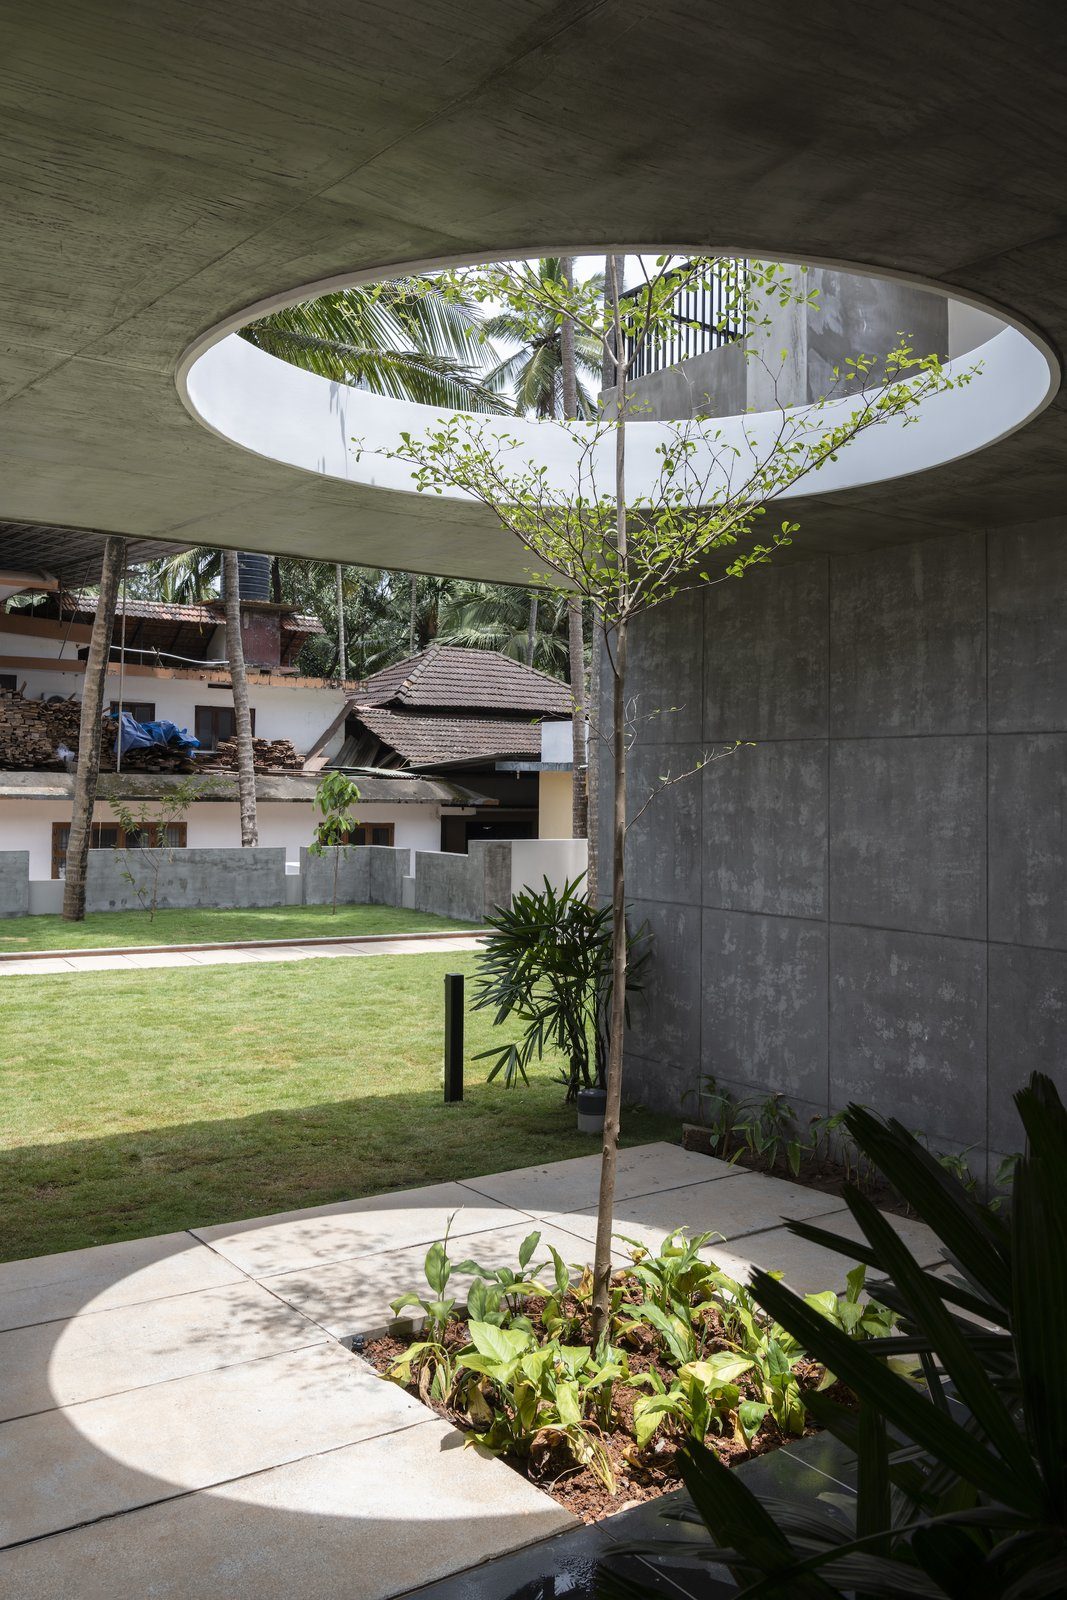 Pakhaniyil Residence skylight